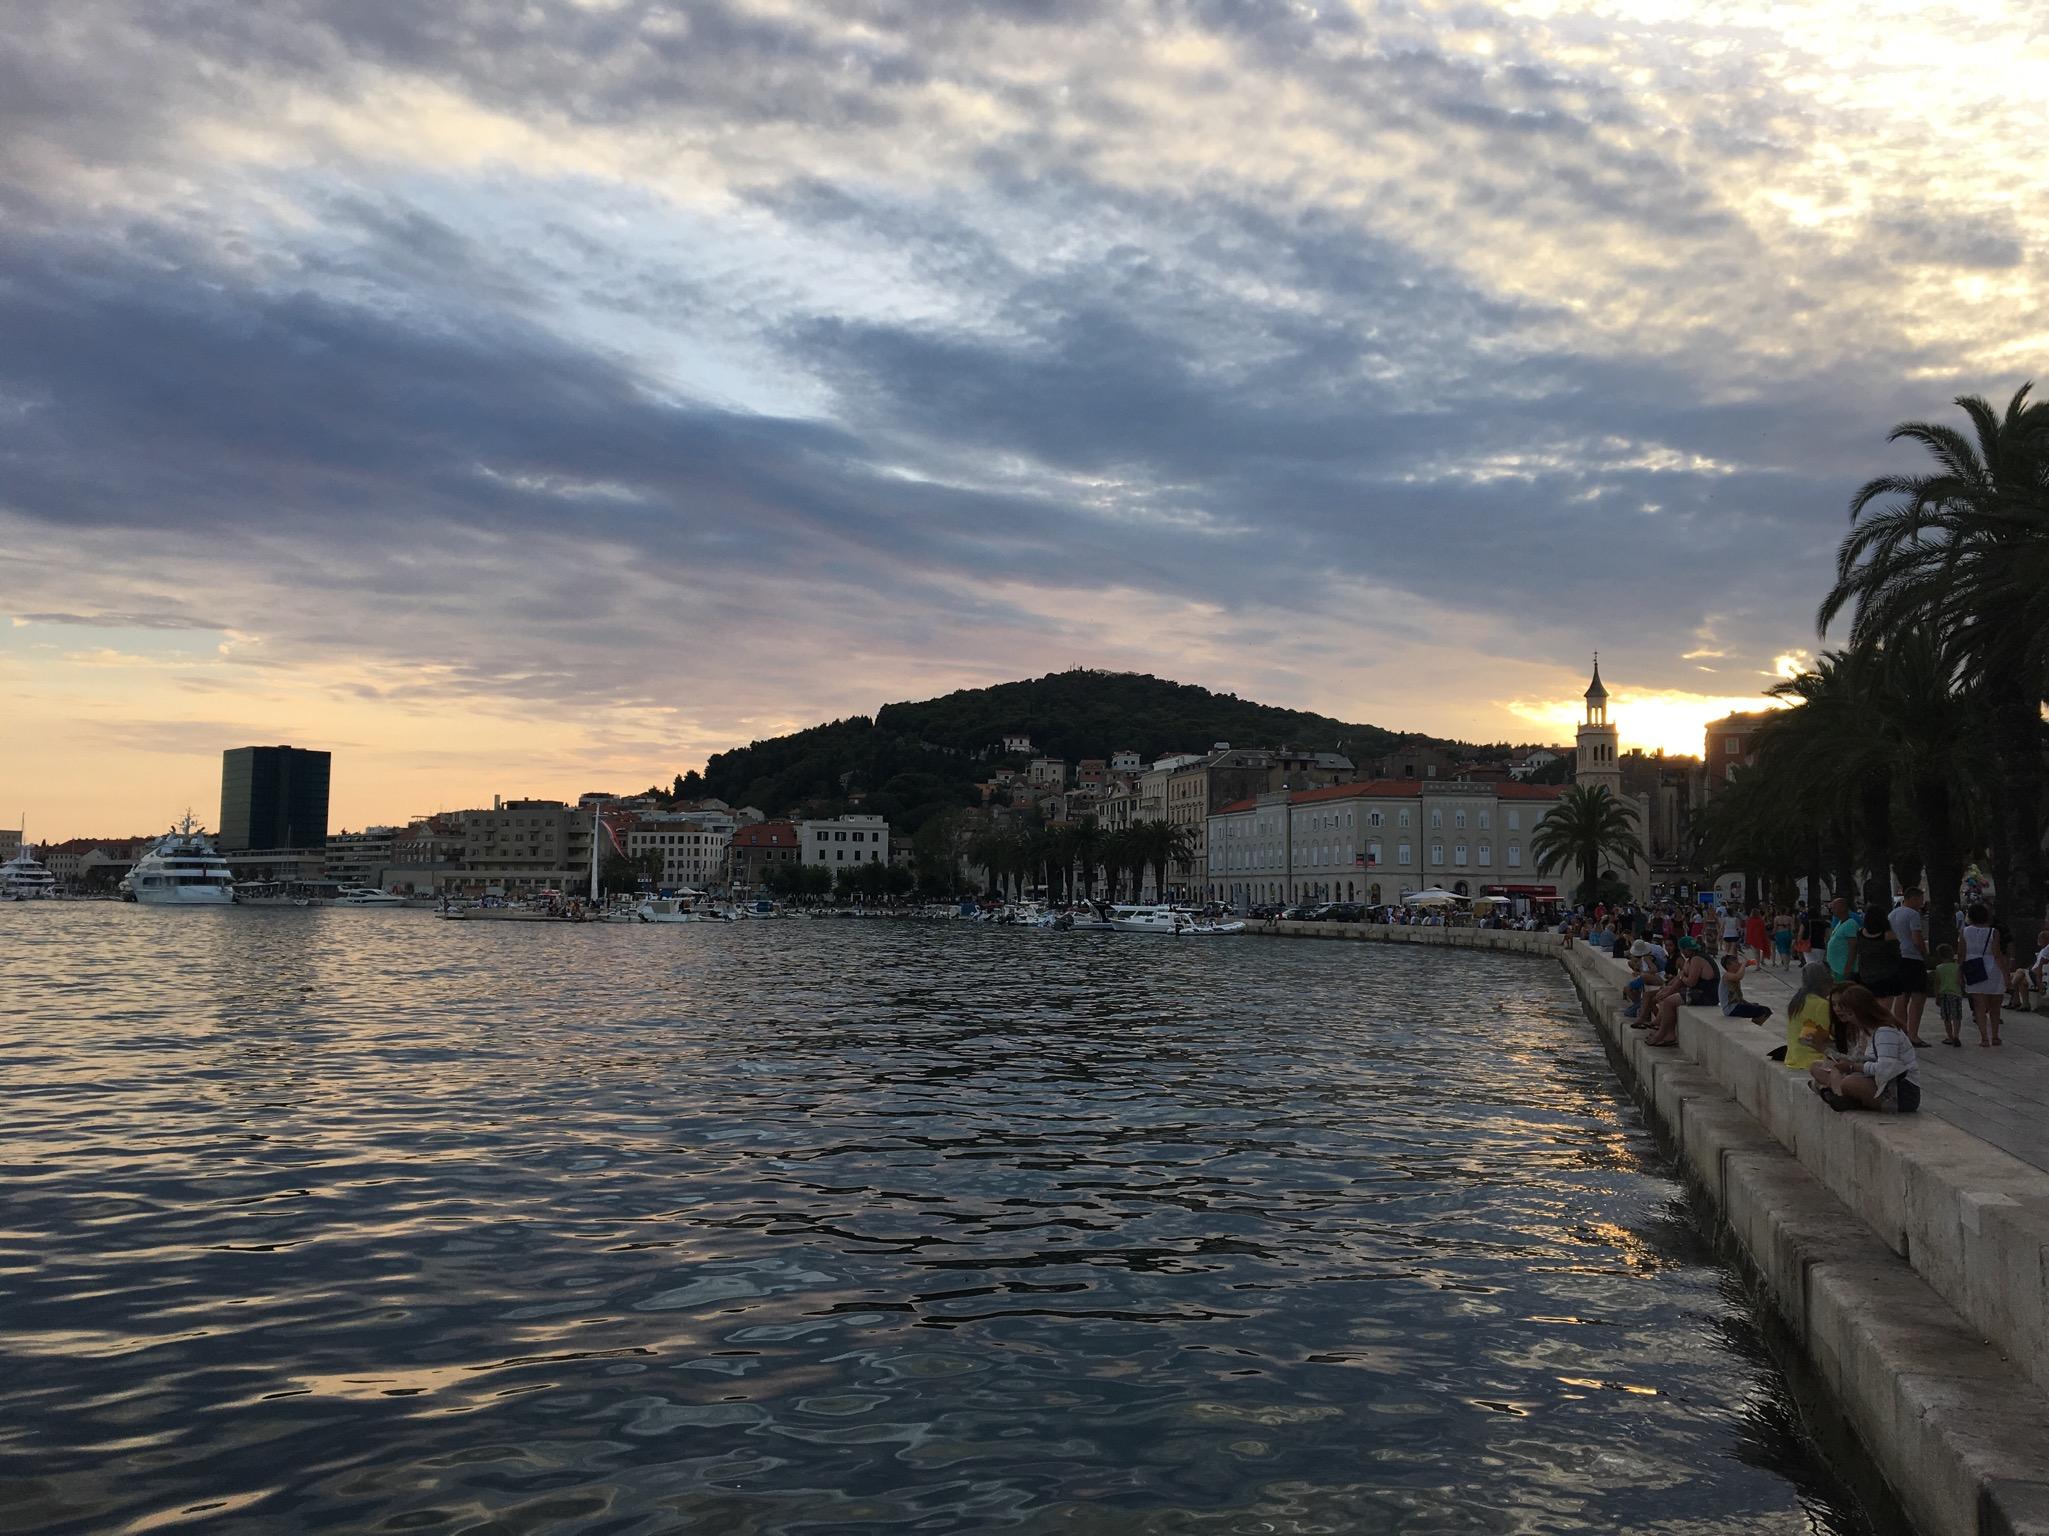 Riva at sunset